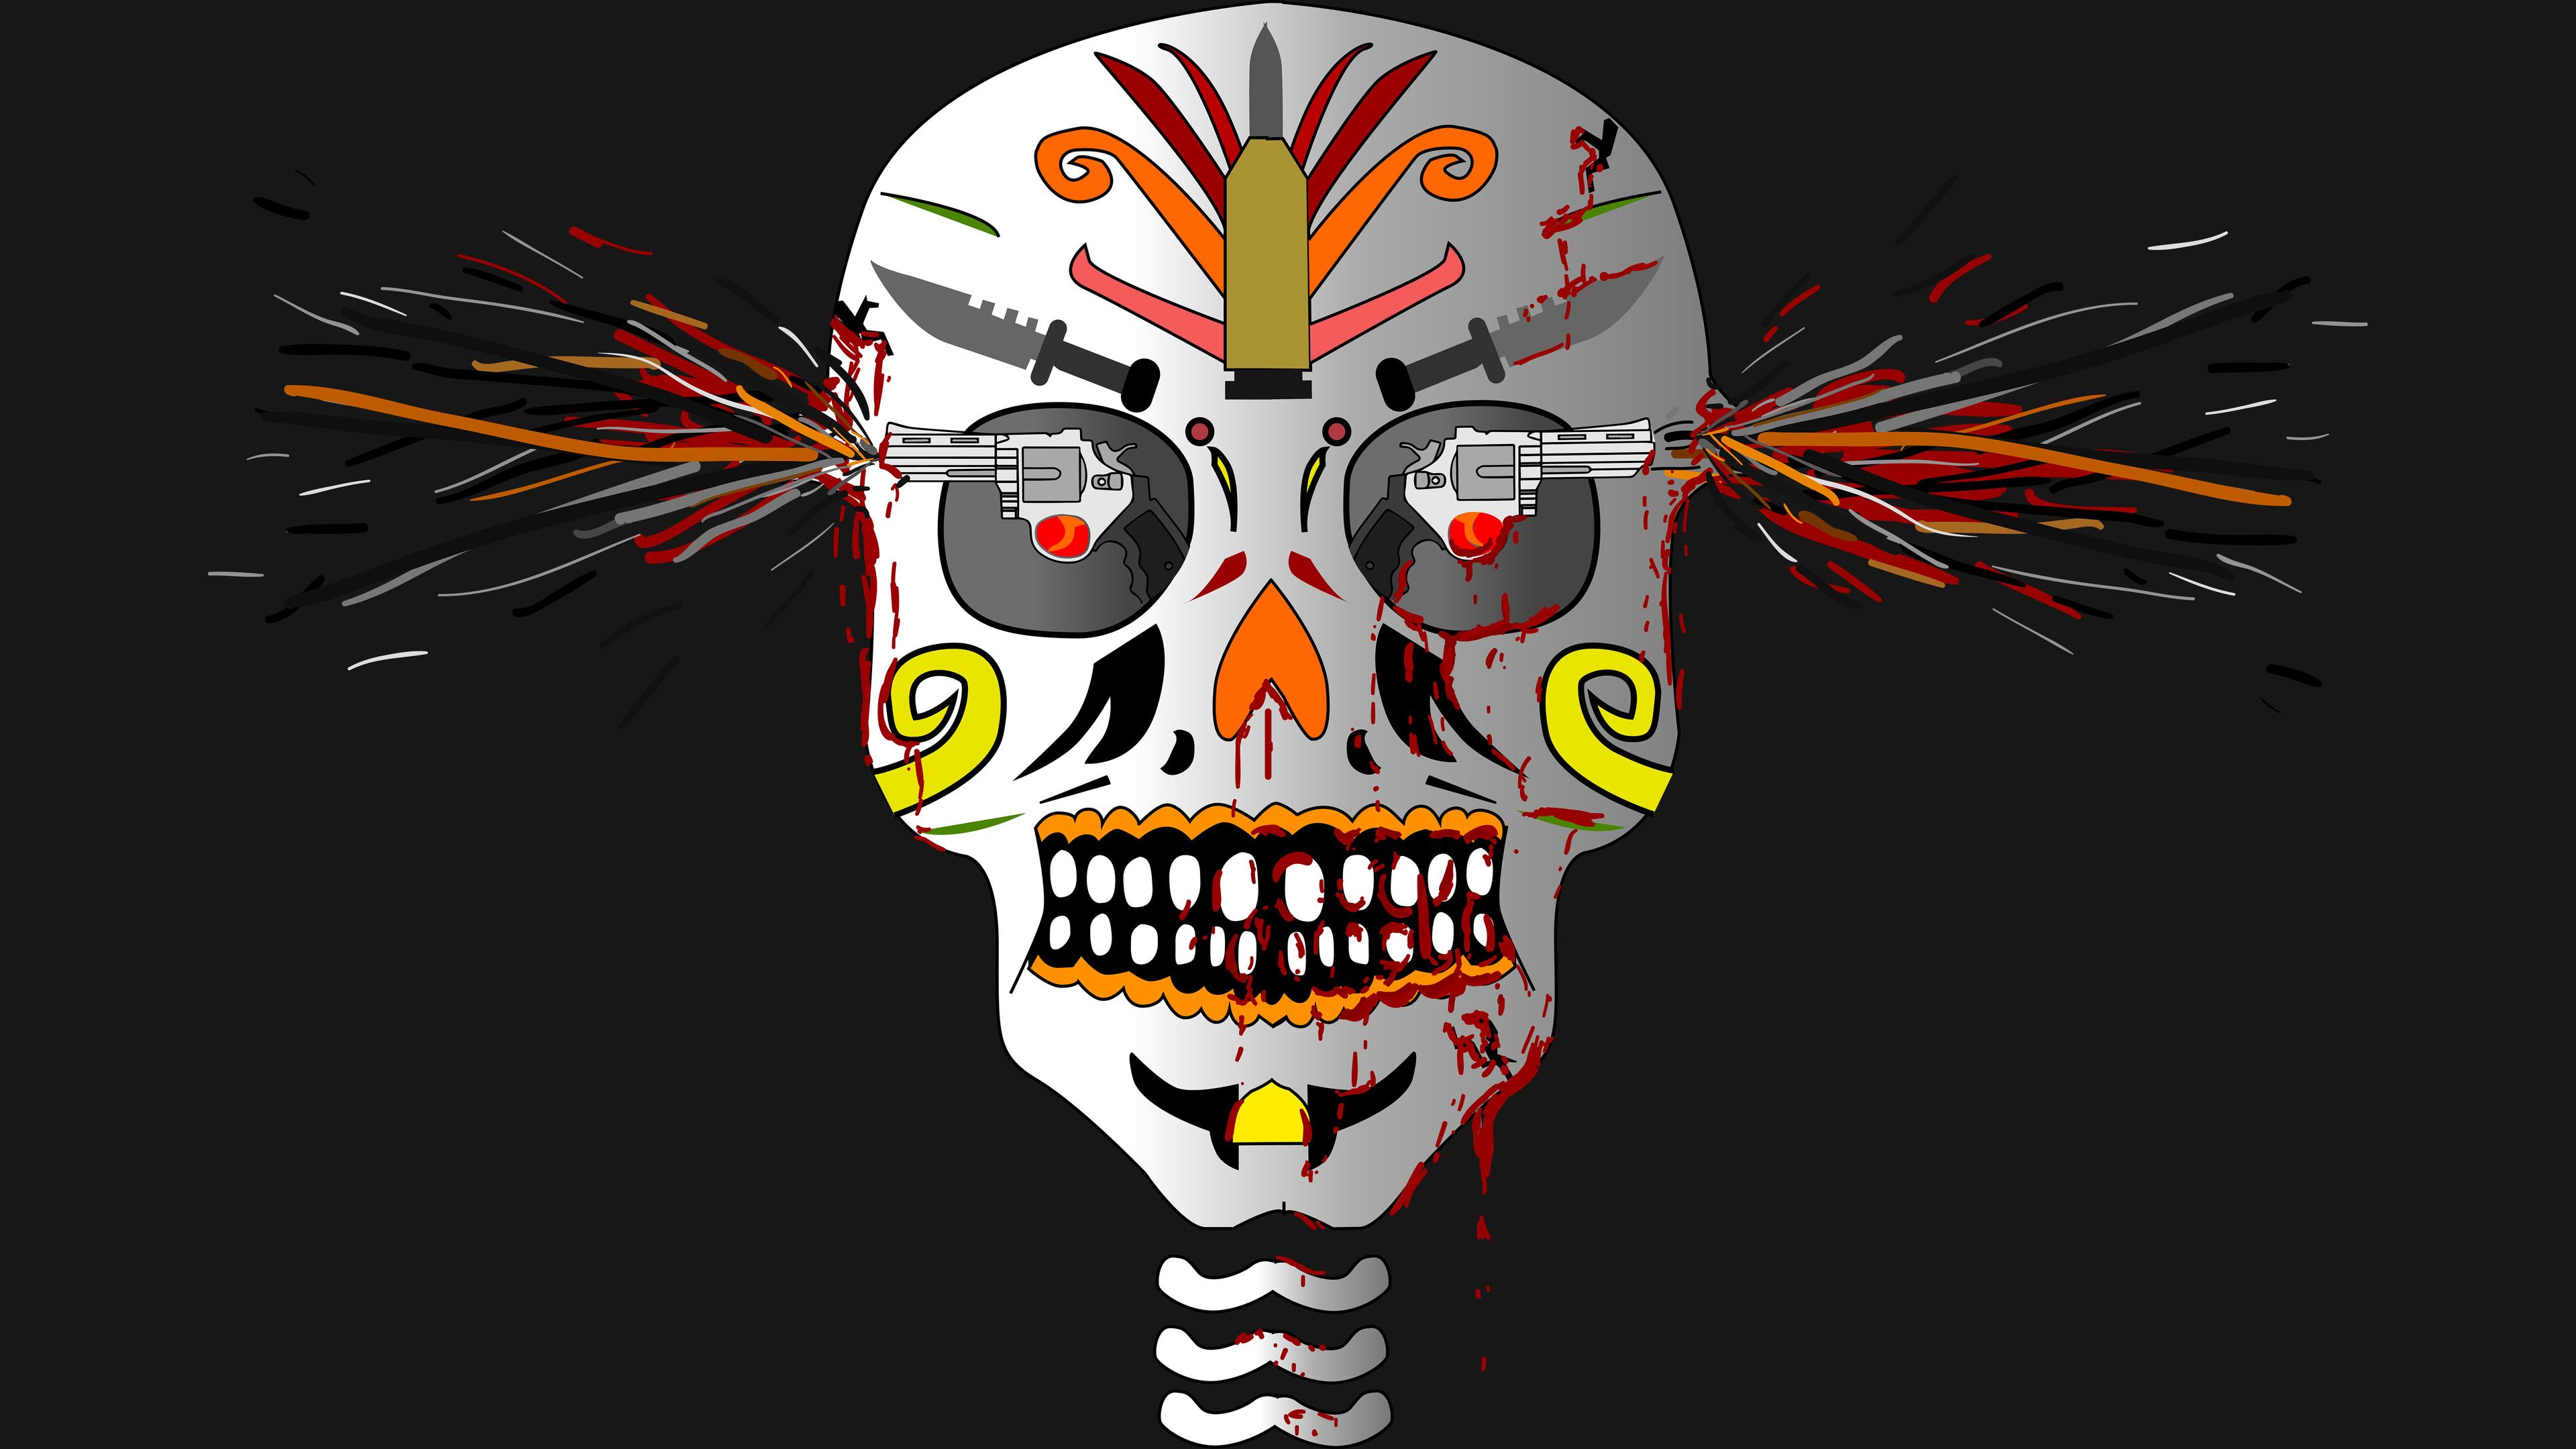 skull and gun art 4k 1540754428 - Skull And Gun Art 4k - skull wallpapers, hd-wallpapers, gun wallpapers, digital art wallpapers, artwork wallpapers, artist wallpapers, 8k wallpapers, 5k wallpapers, 4k-wallpapers